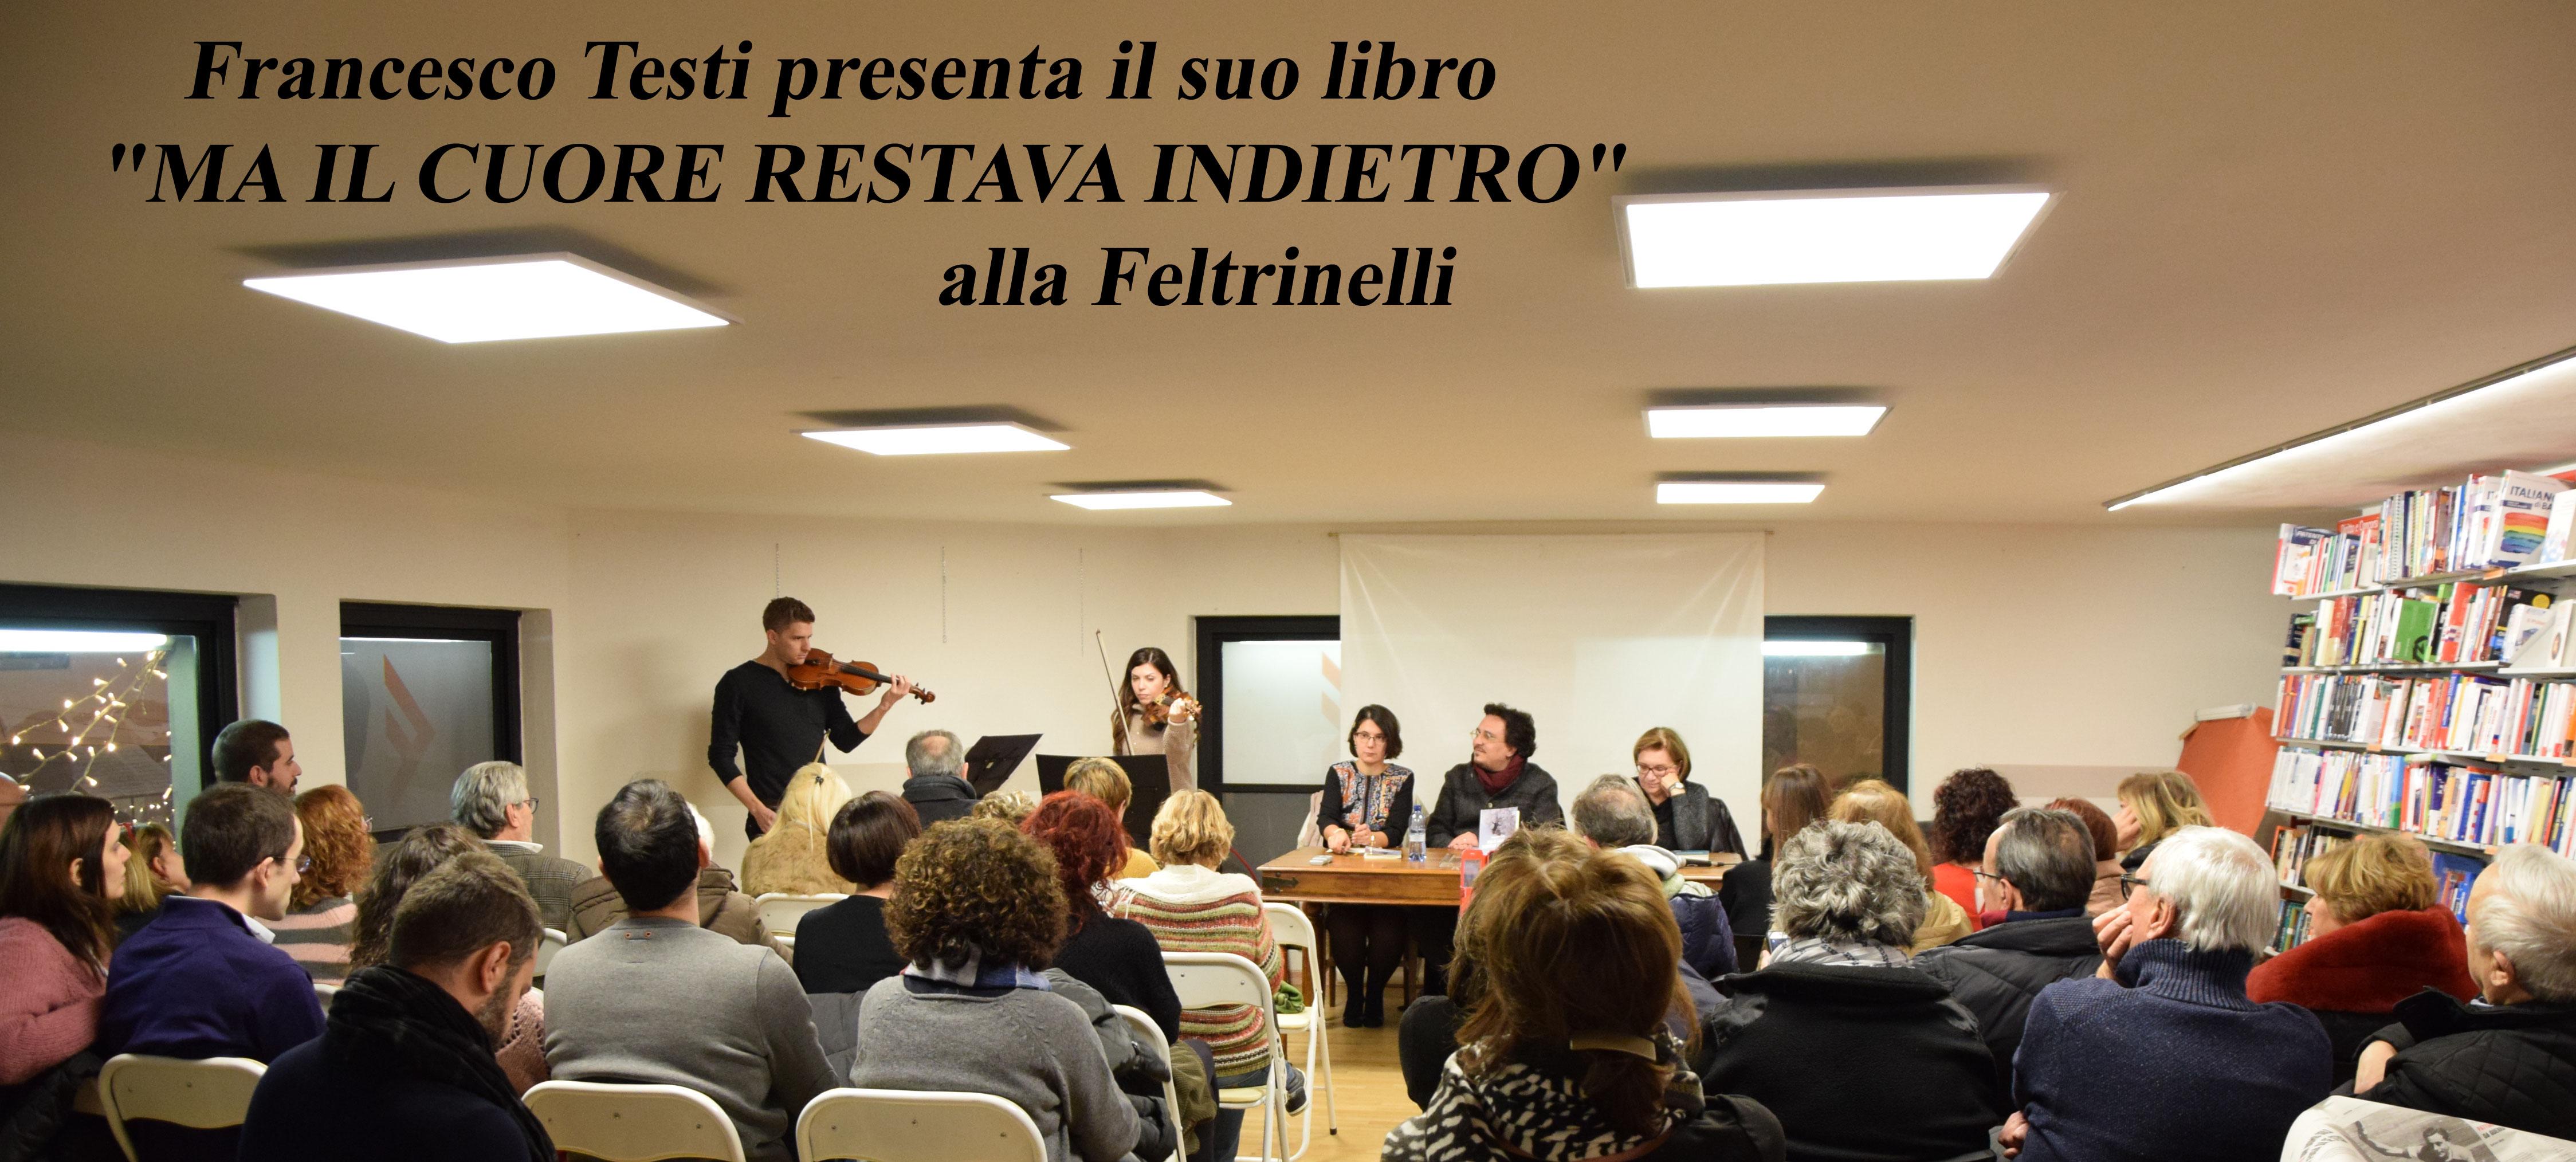 feltrinelli-1